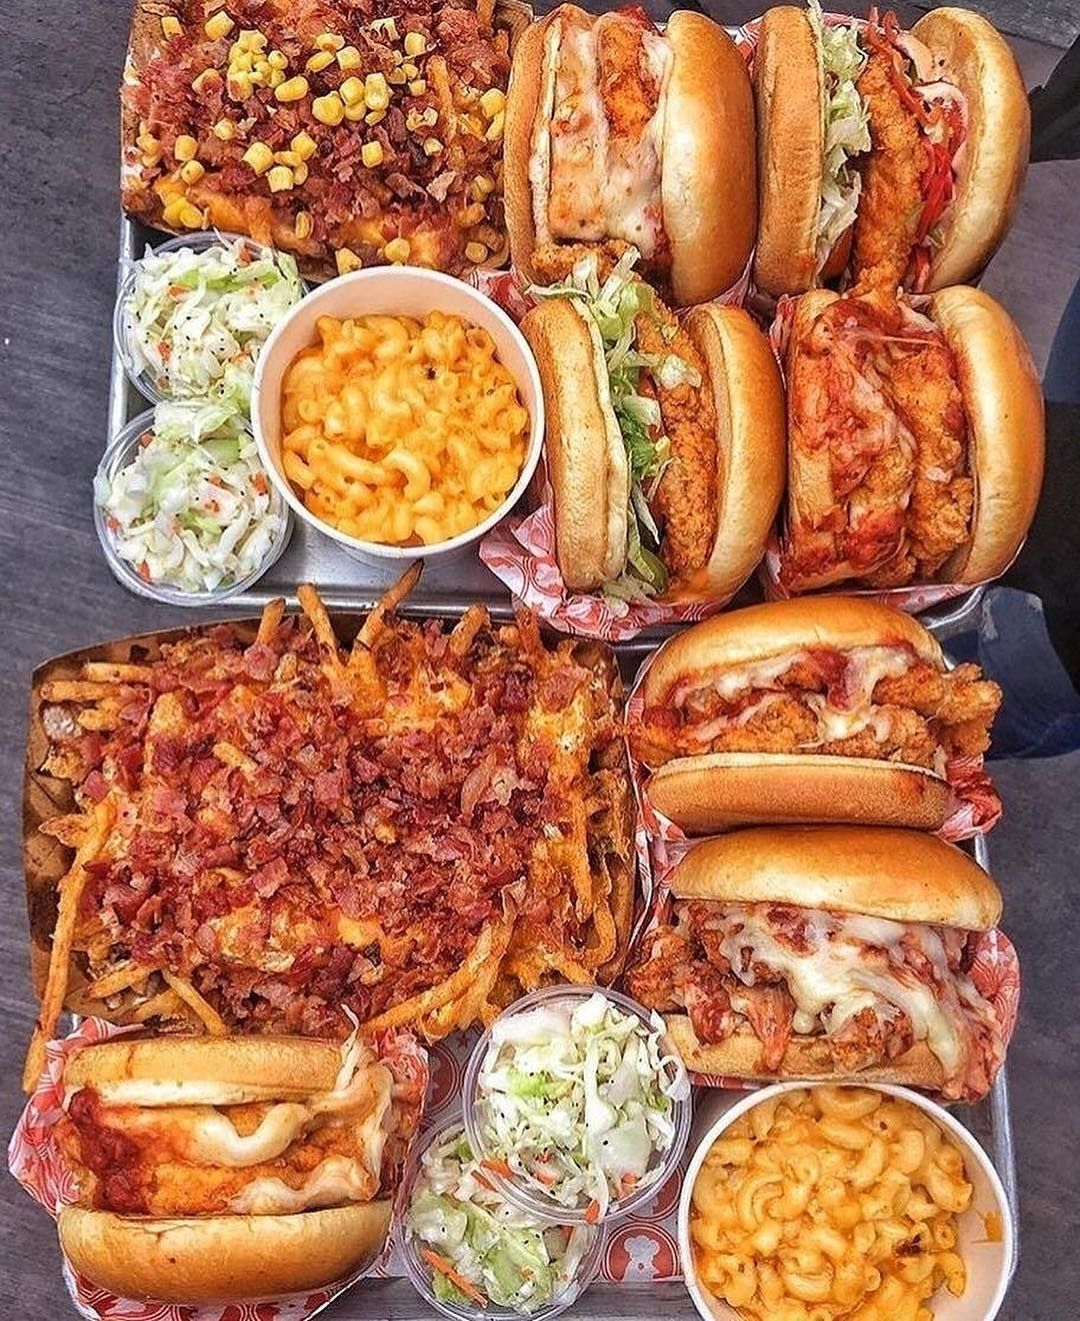 Pinterest Queen Thats Me Food Cravings Love Food Unhealthy Food